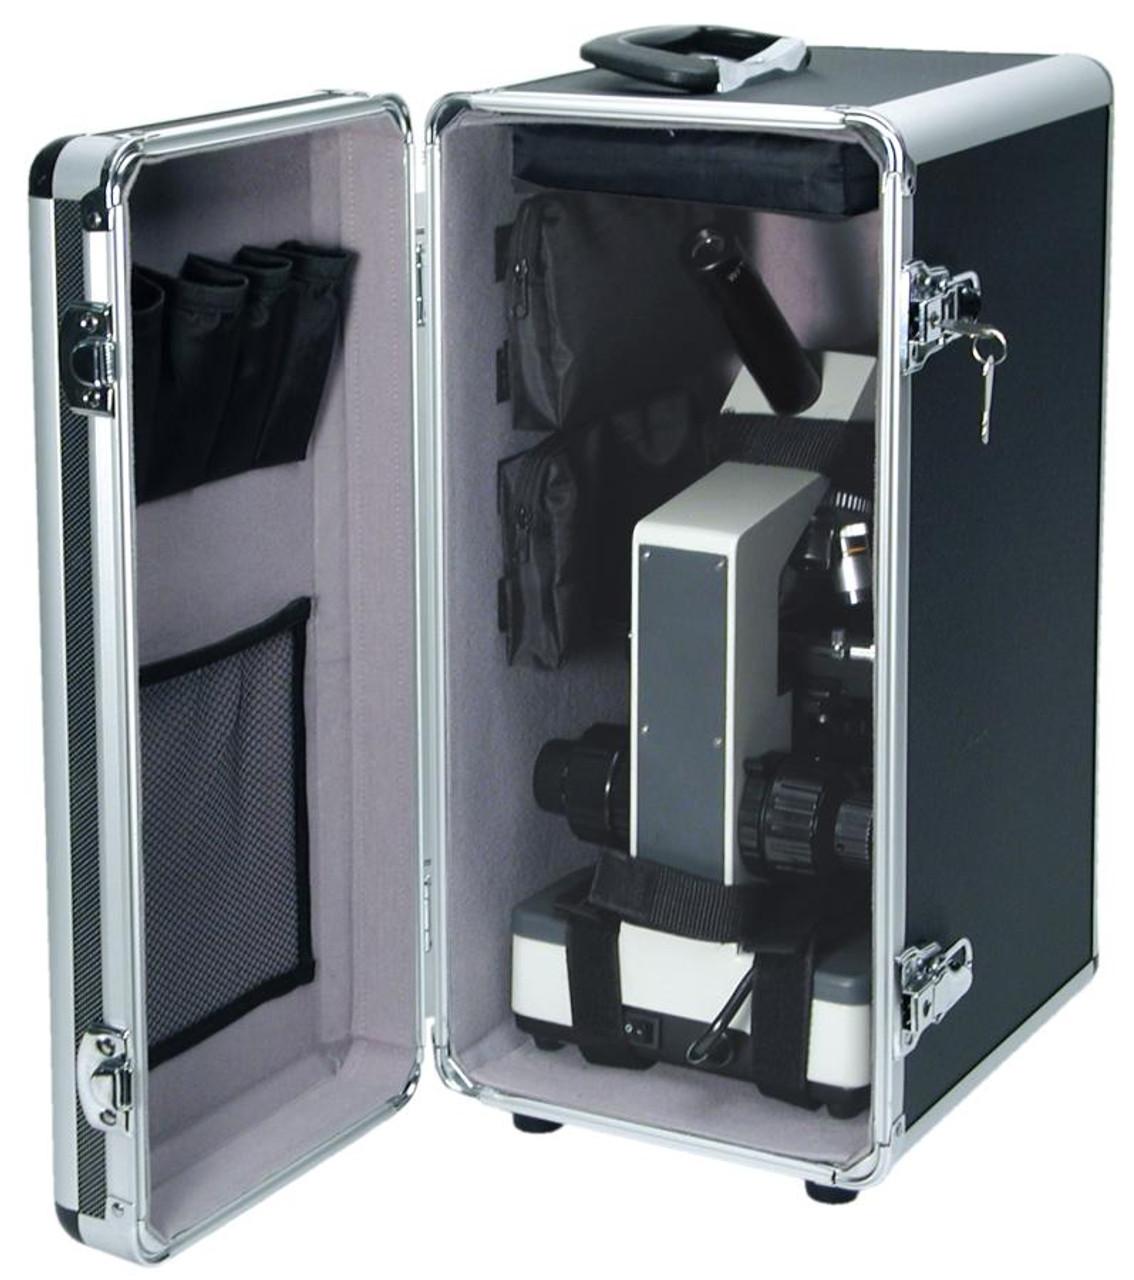 microscope gift guide - deluxe microscope case